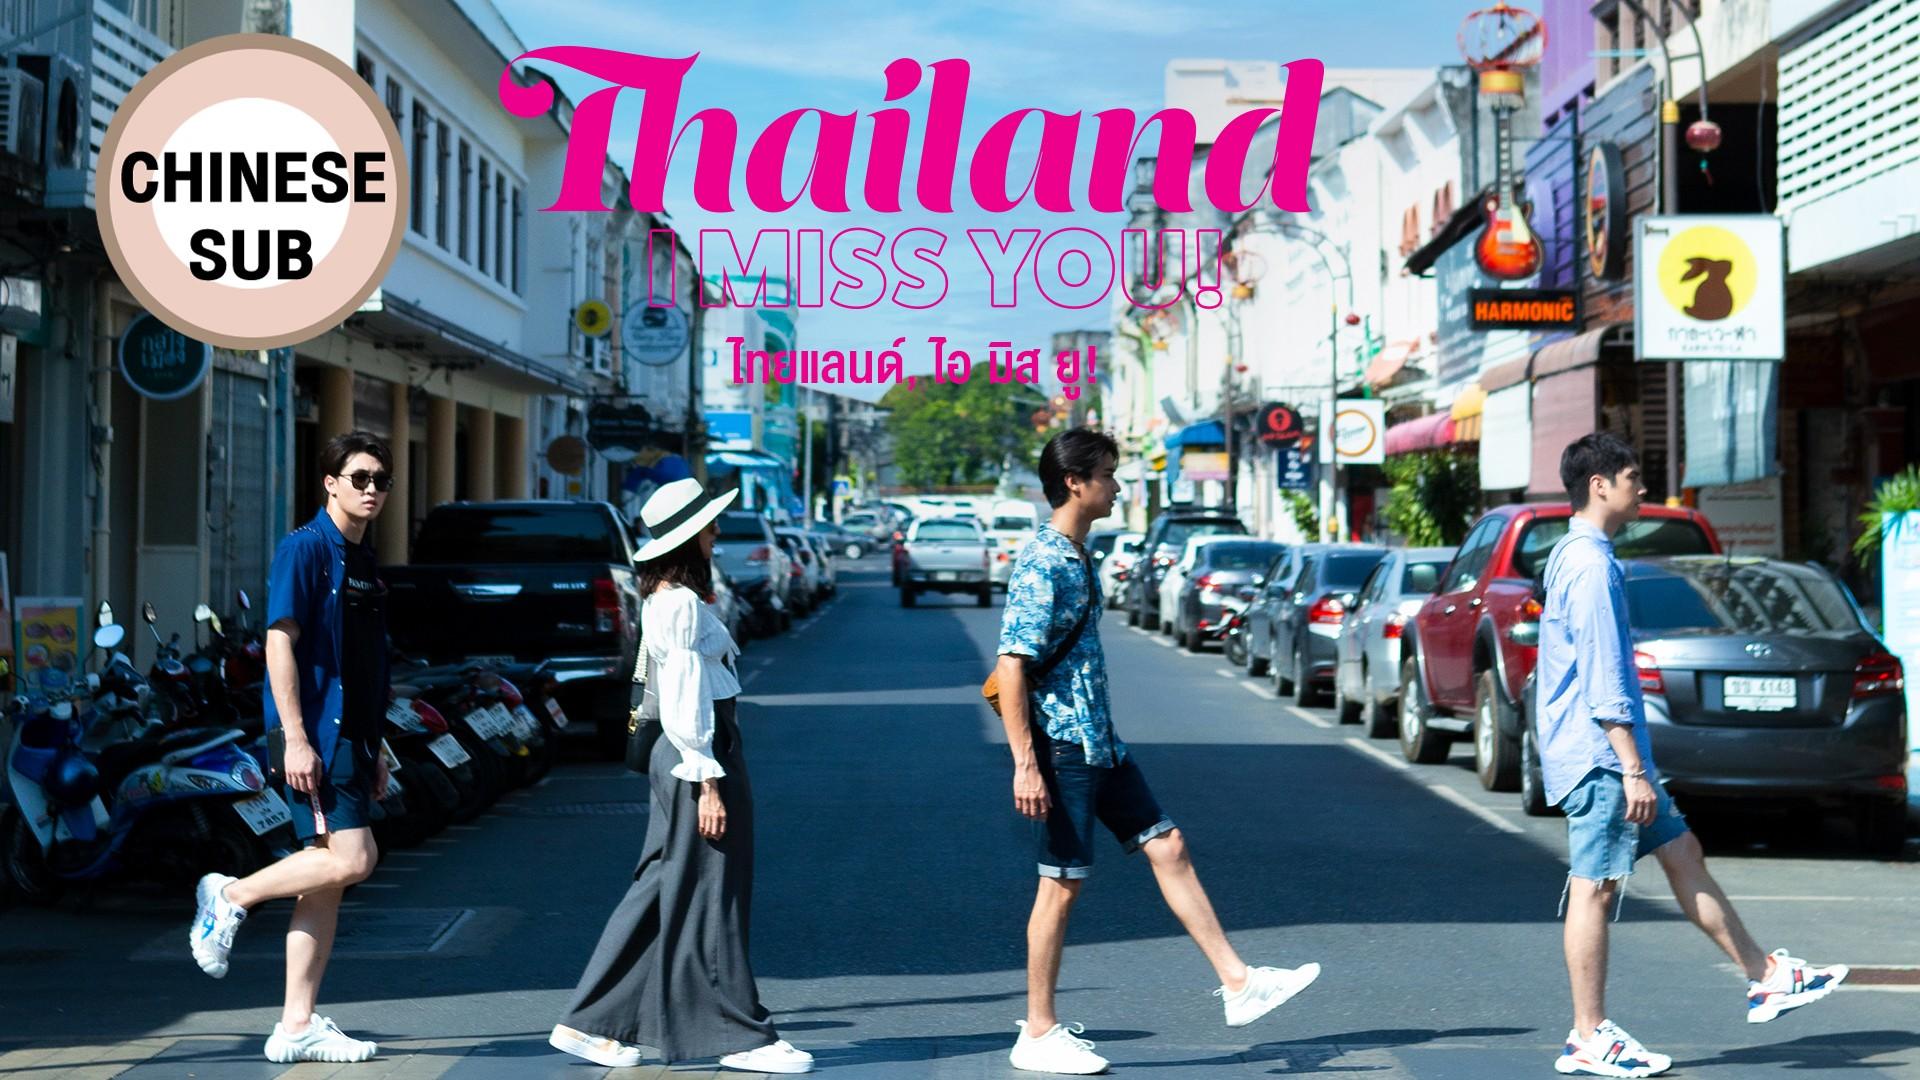 [Chinese Sub] Thailand, I Miss You!